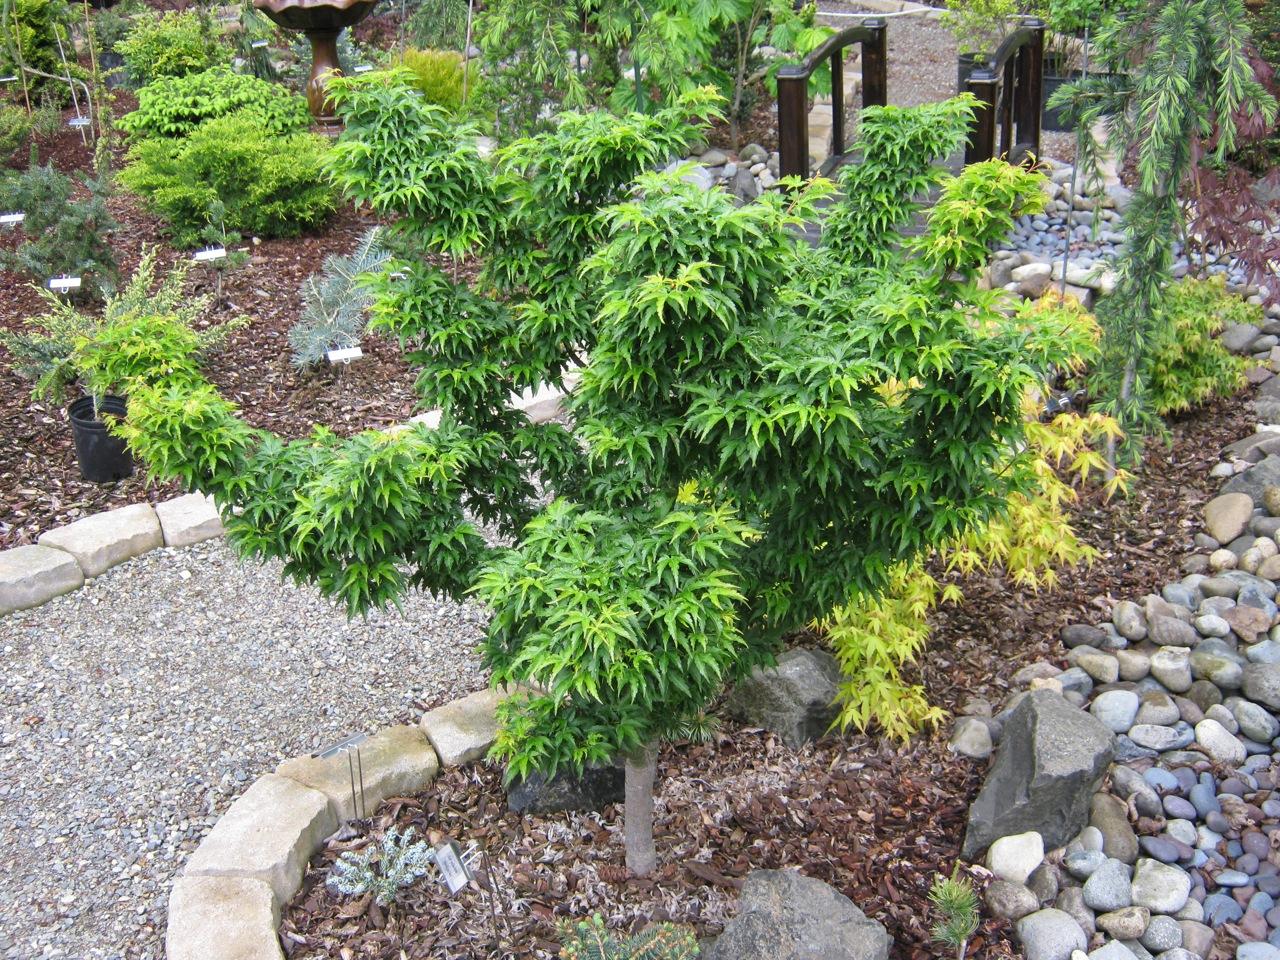 Acer palmatum Shishigashira Japanese maple broadleaf green dwarf